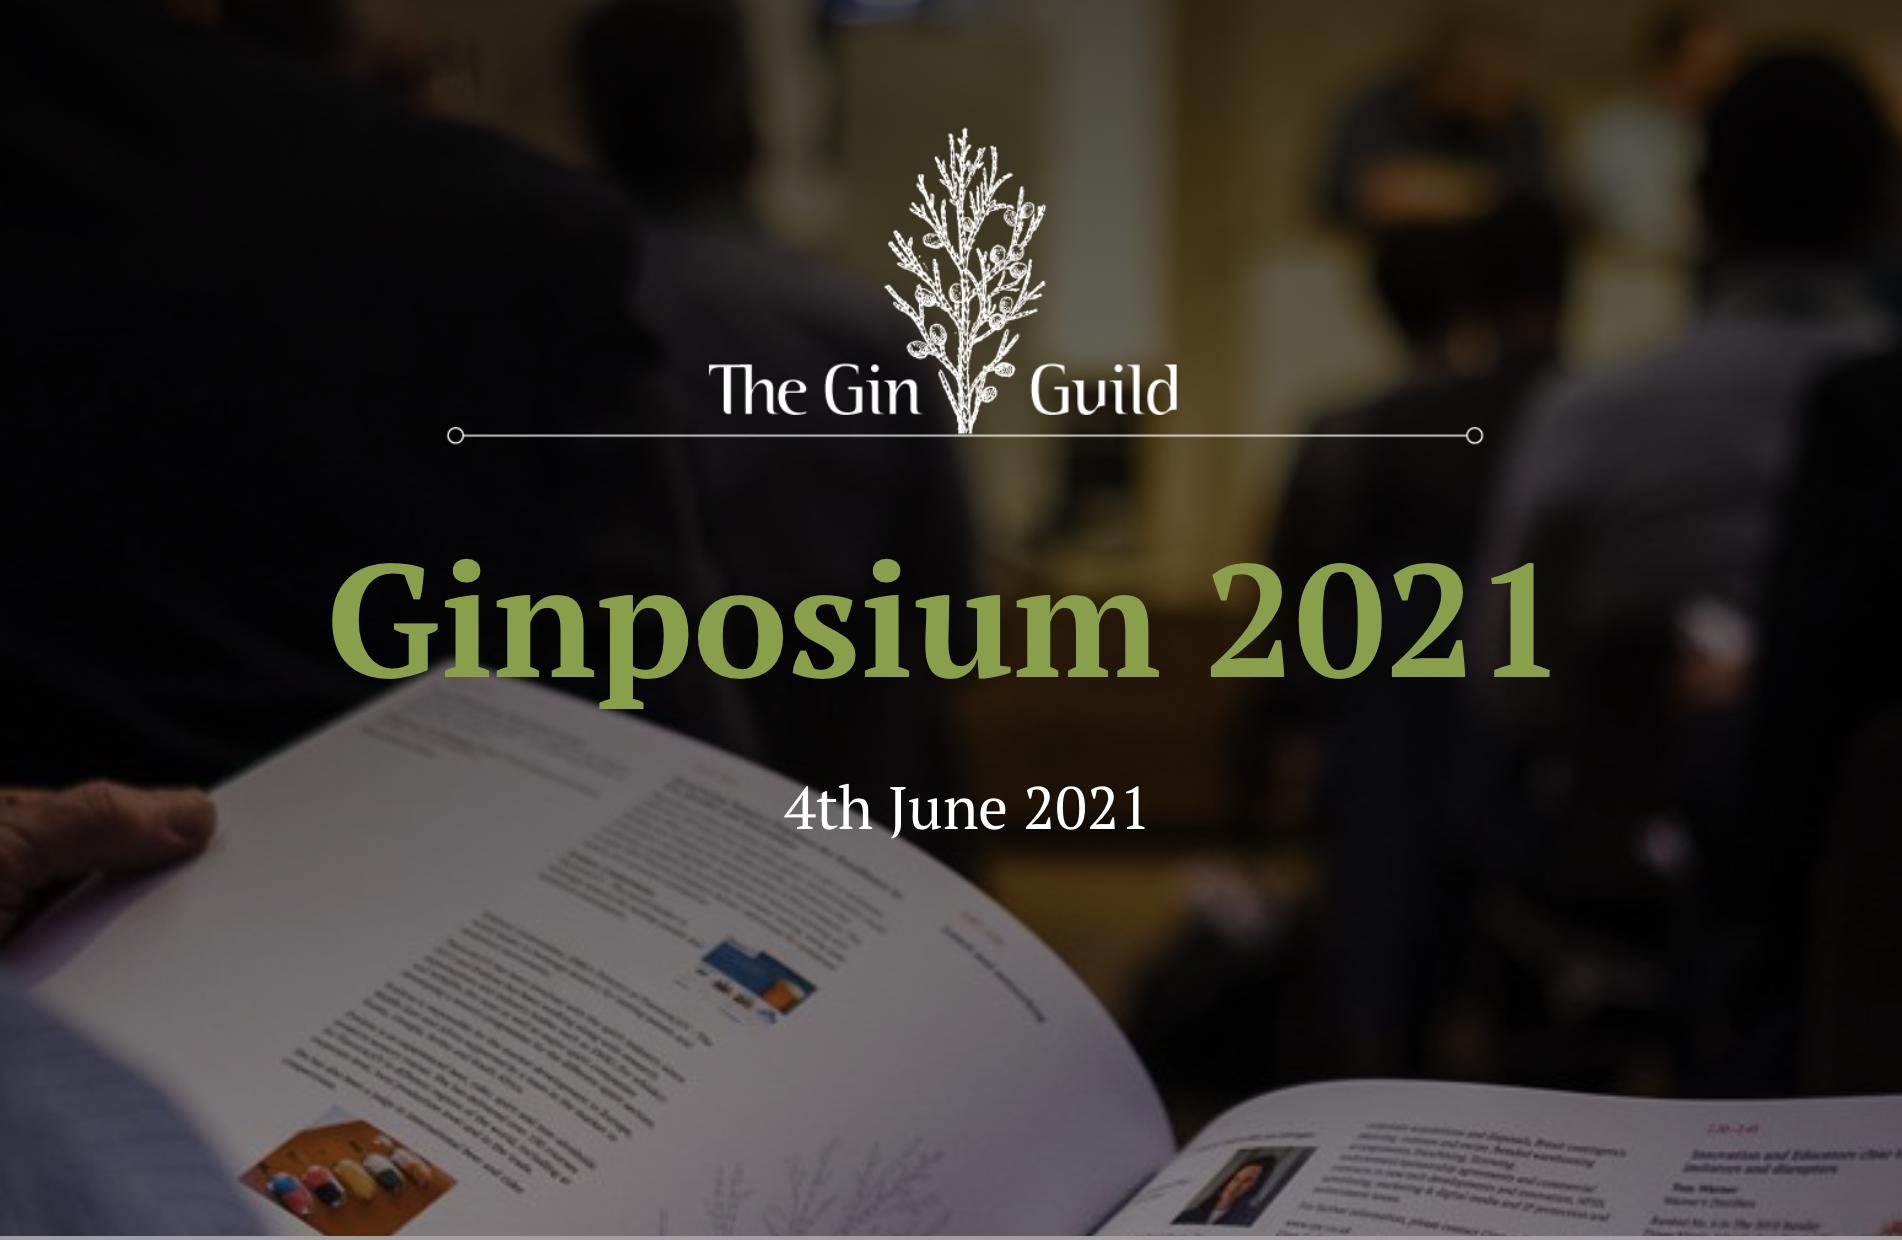 Ginposium Gin Guild 2021